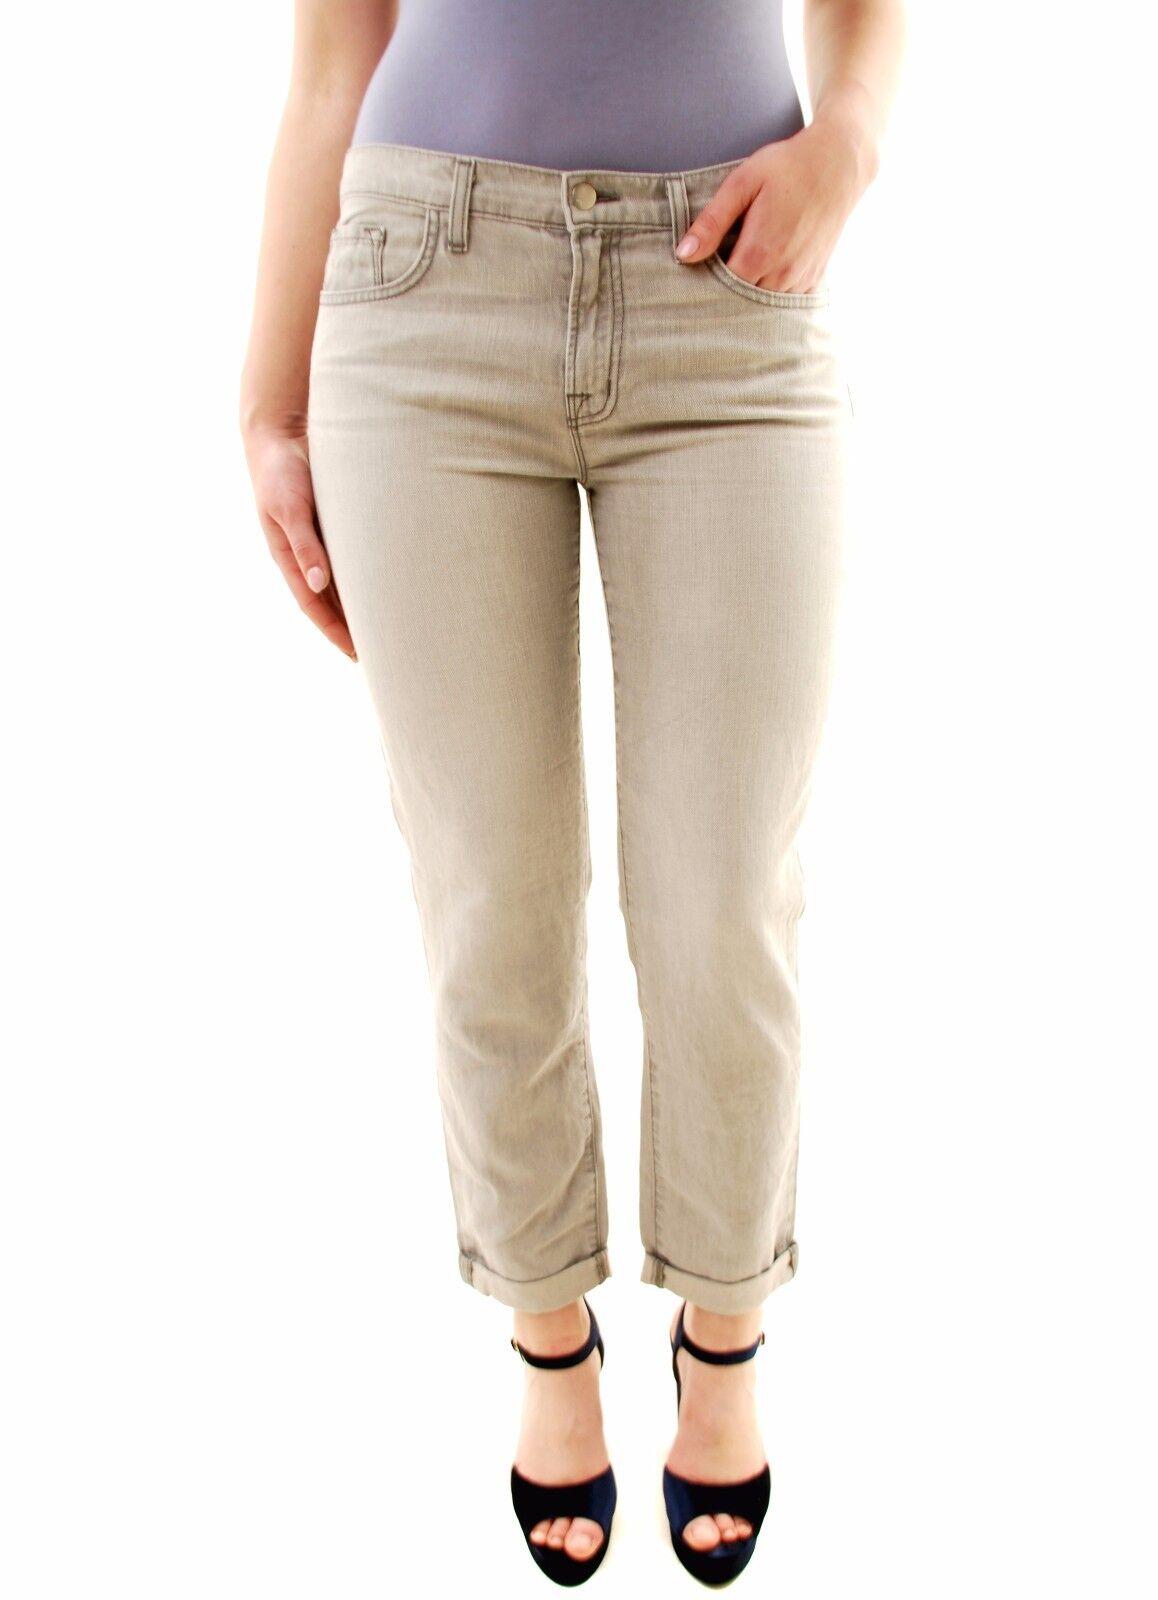 J Brand Women's Aidan Boyfriend Constellat Jeans Grey Size 27 RRP  227 BCF71